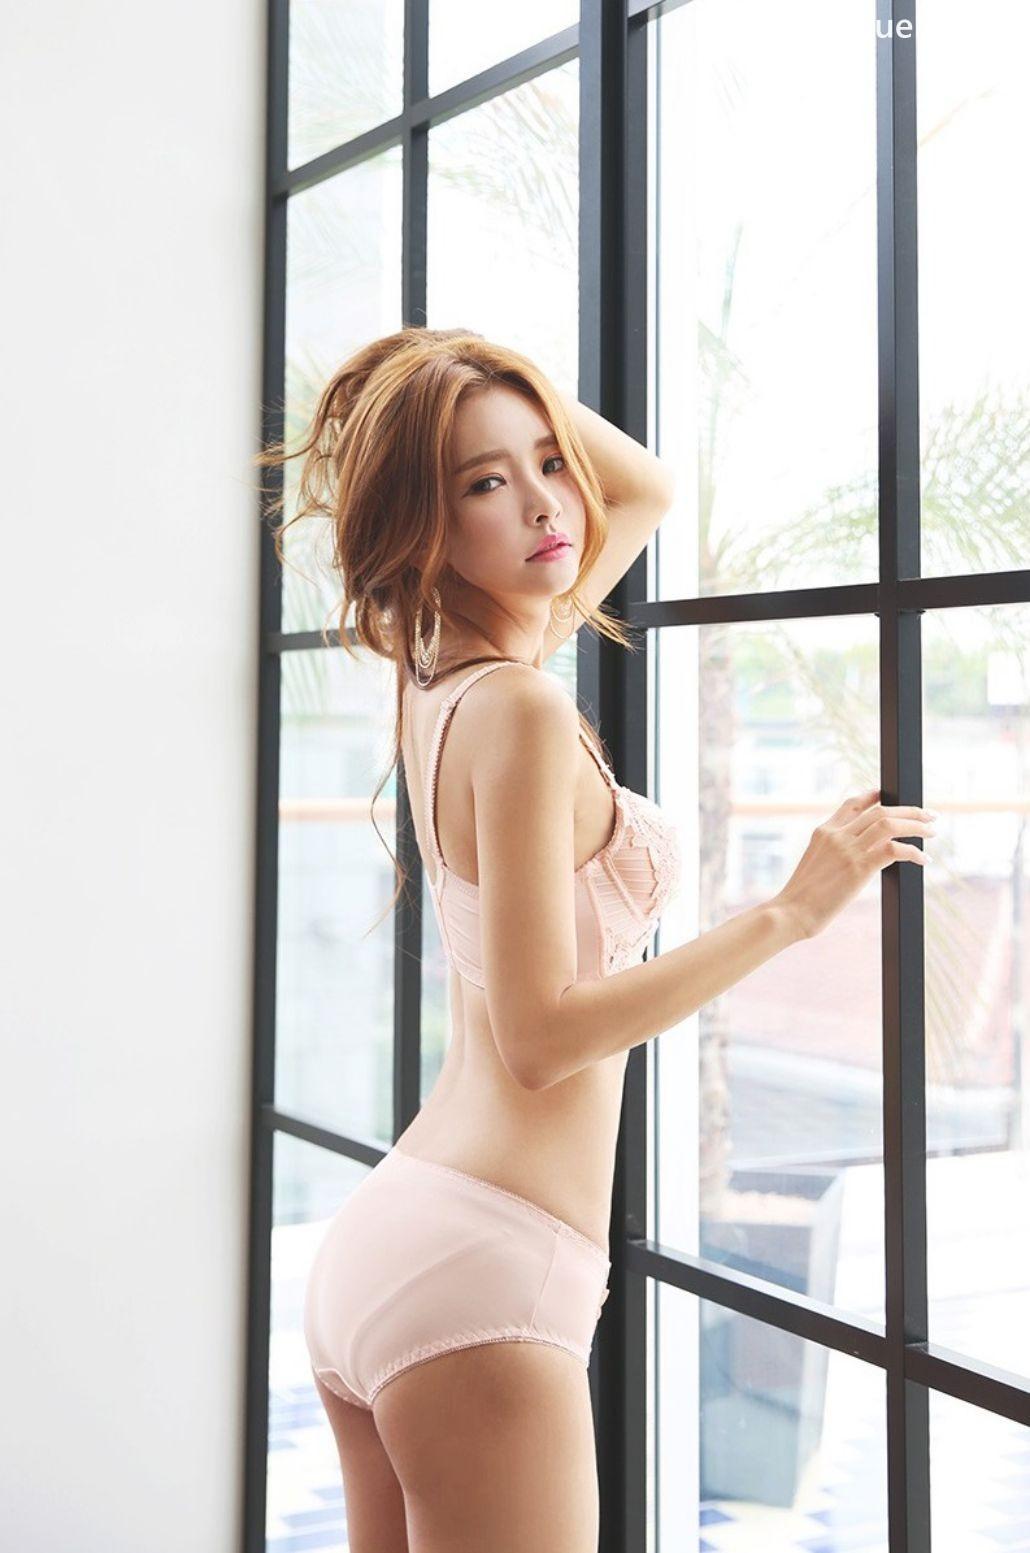 Image-Korean-Fashion Model-Shin-Eun-Ji-Various-Lingerie-Set-Collection-TruePic.net- Picture-3